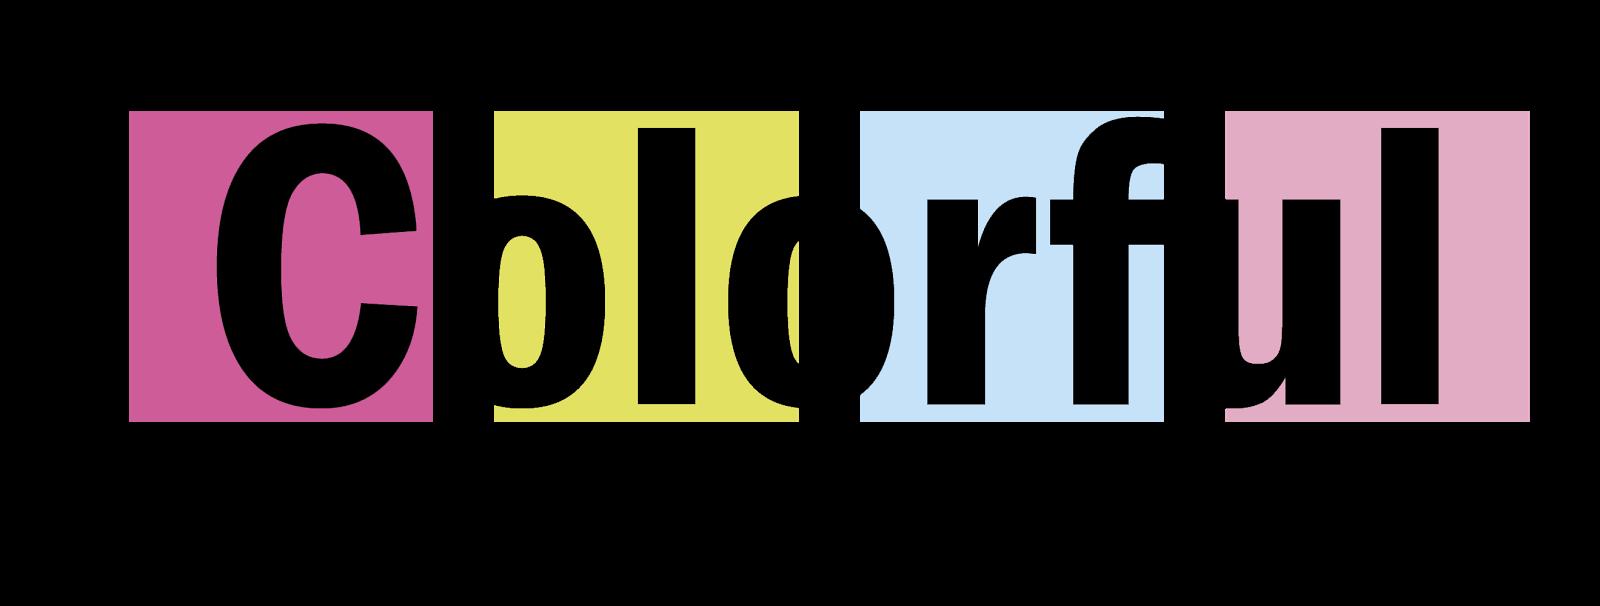 http://kiosk.colorfulmedia.pl/